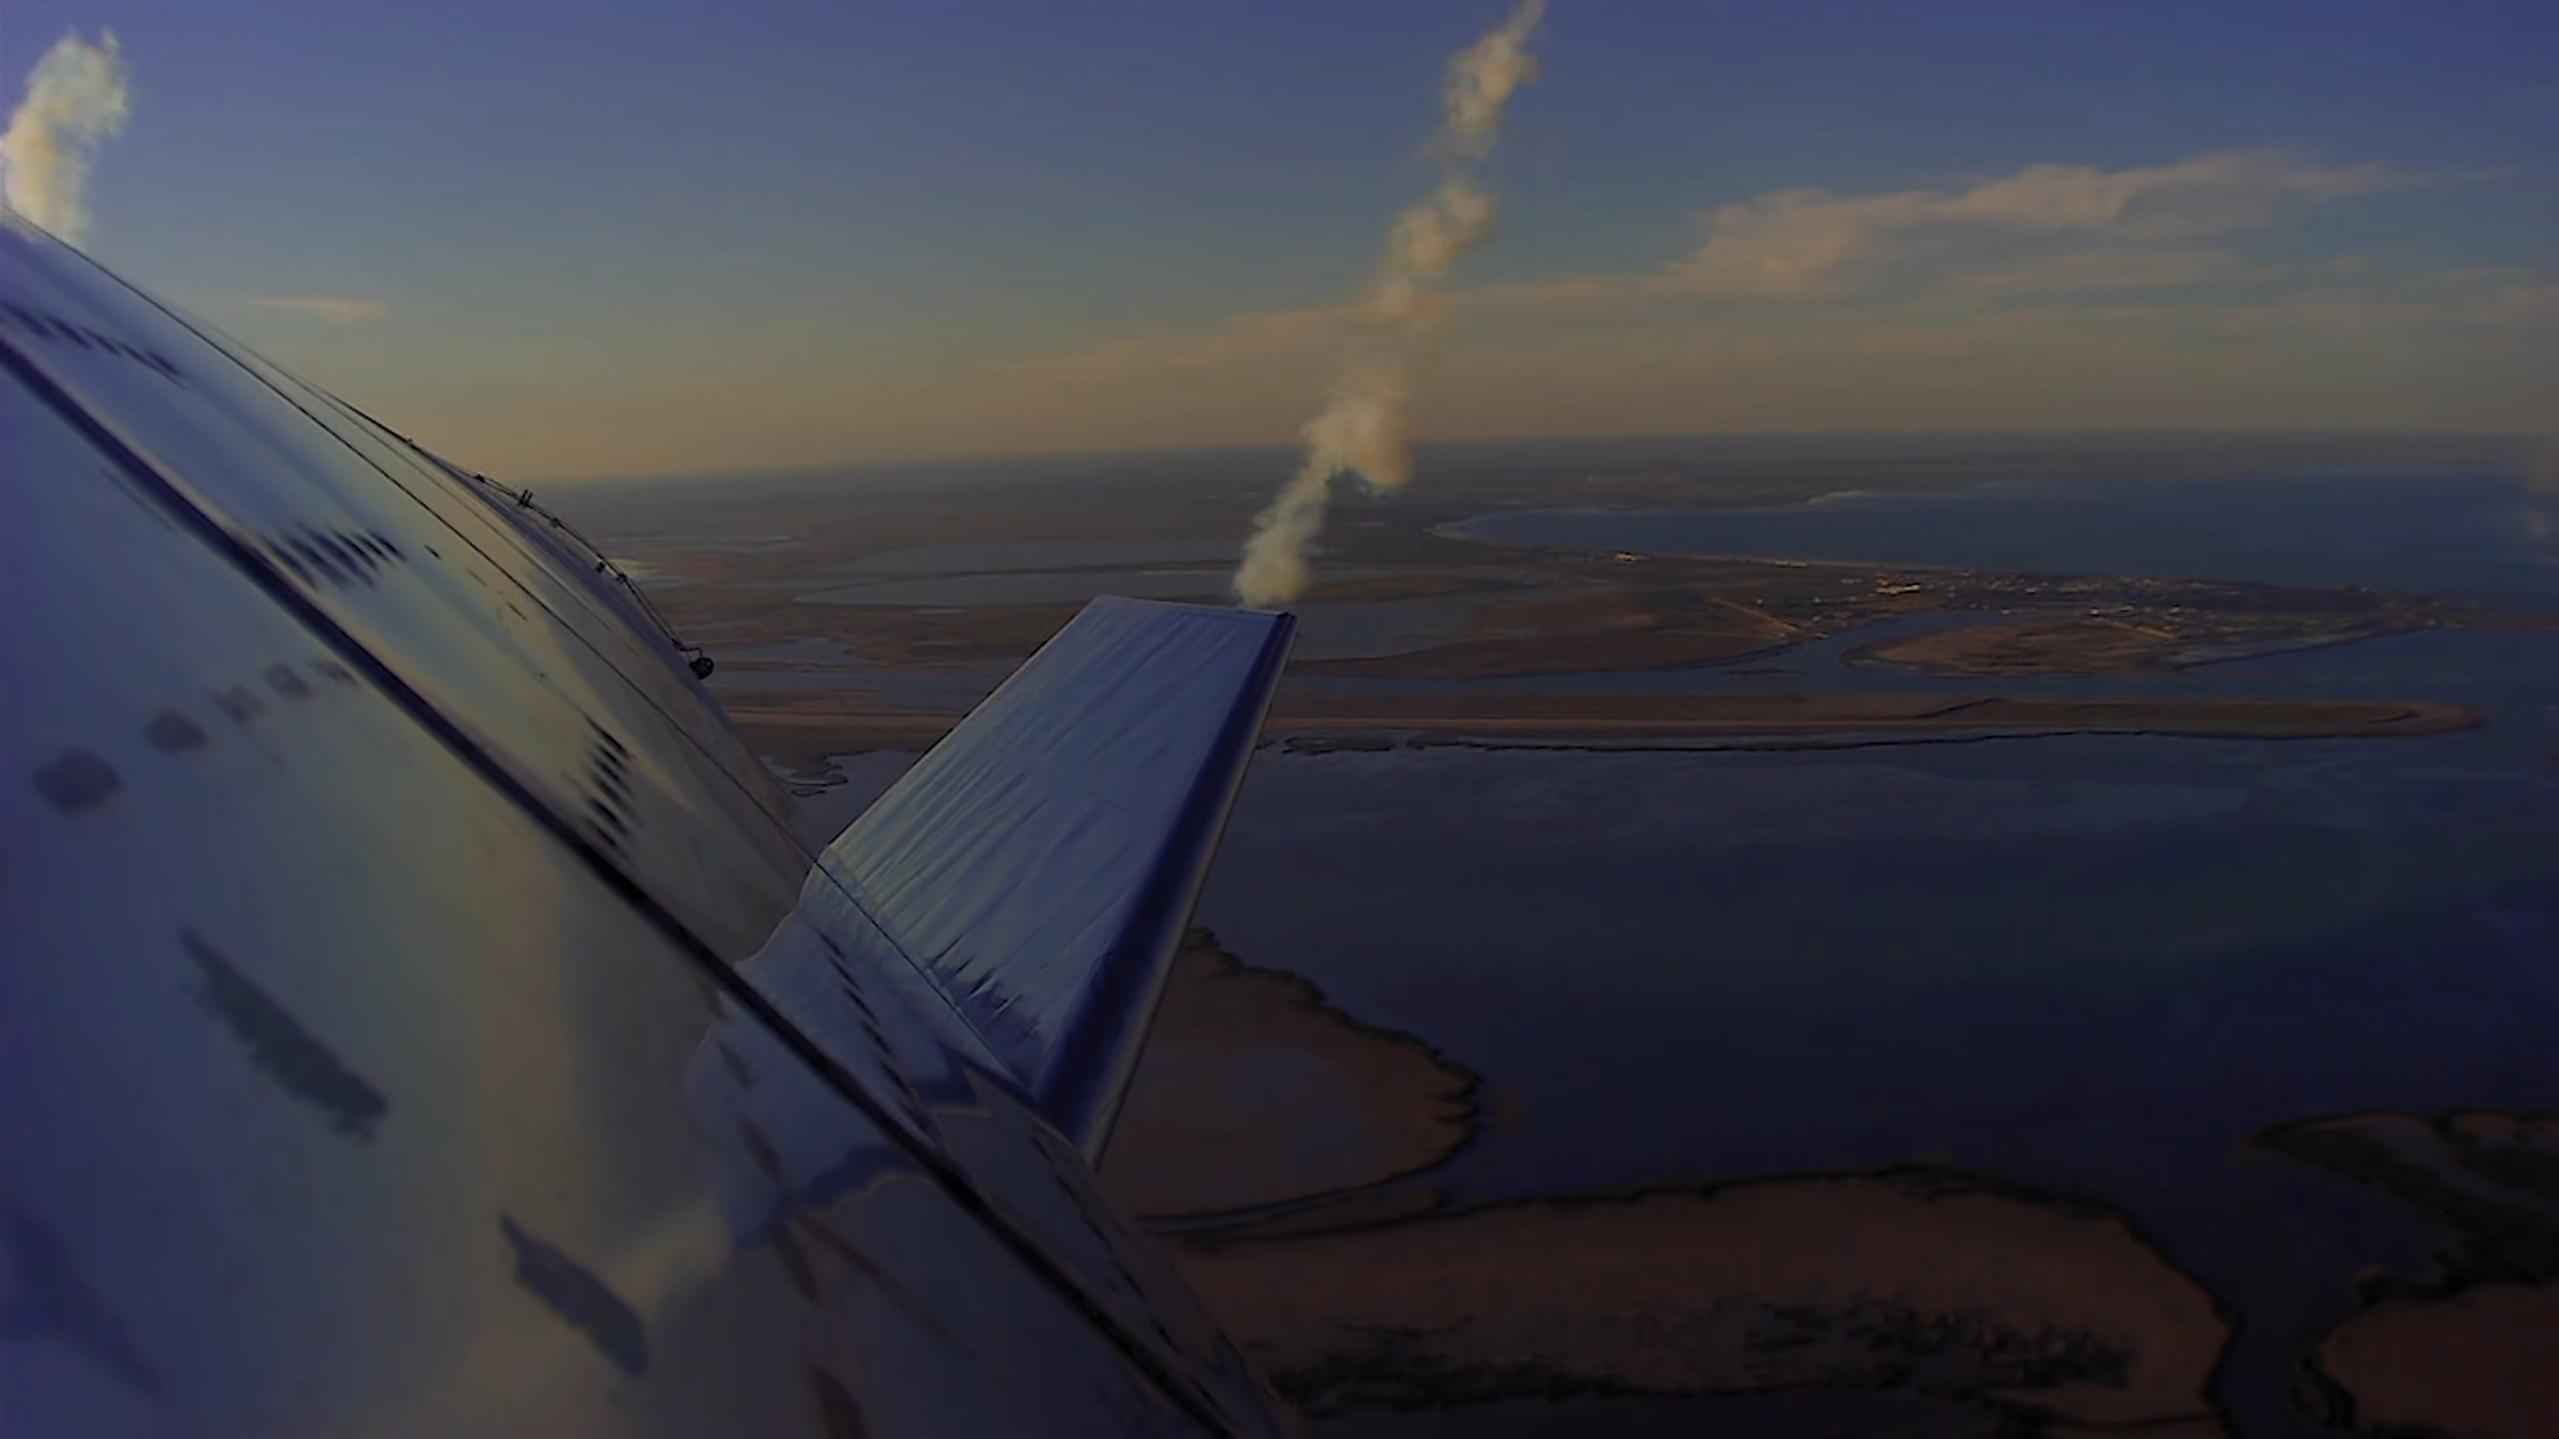 Starship SN8 launch recap 120920 (SpaceX) descent 8 (c)